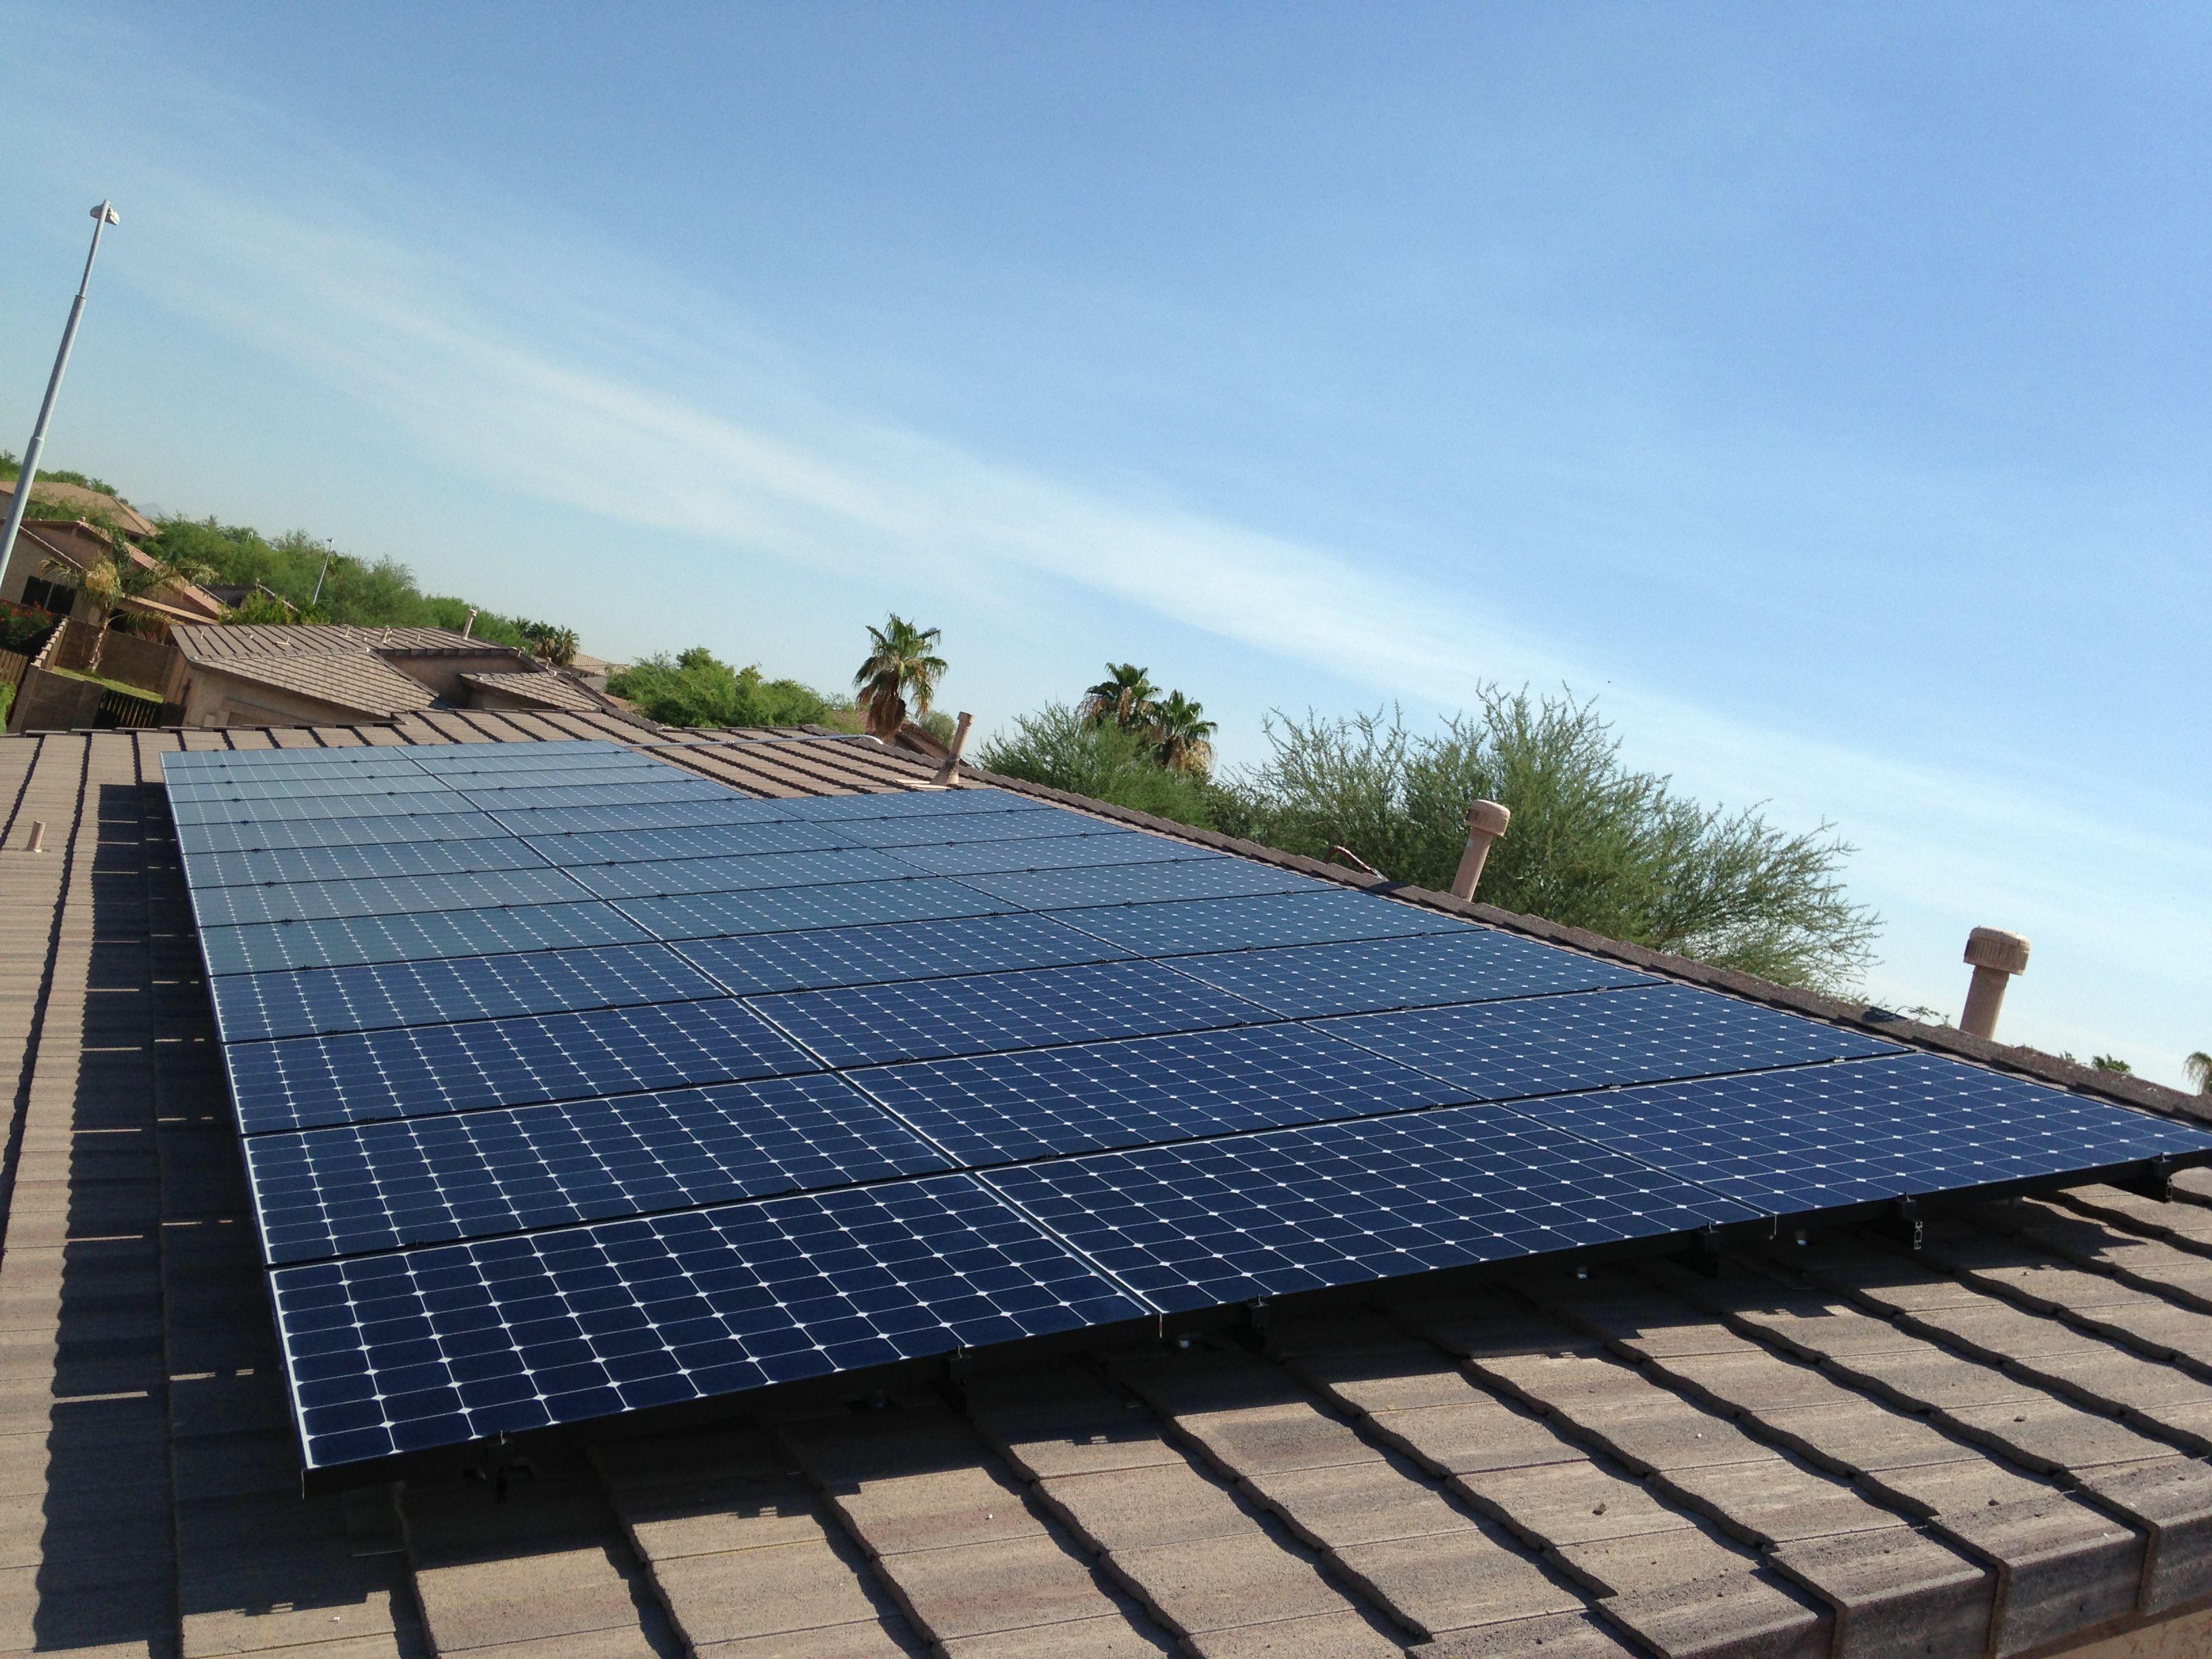 10 464kw Sunpower System West Facing And Will Produce 17 500 Kilowatt Hours Per Year Solar Solar Savings Solar Panels